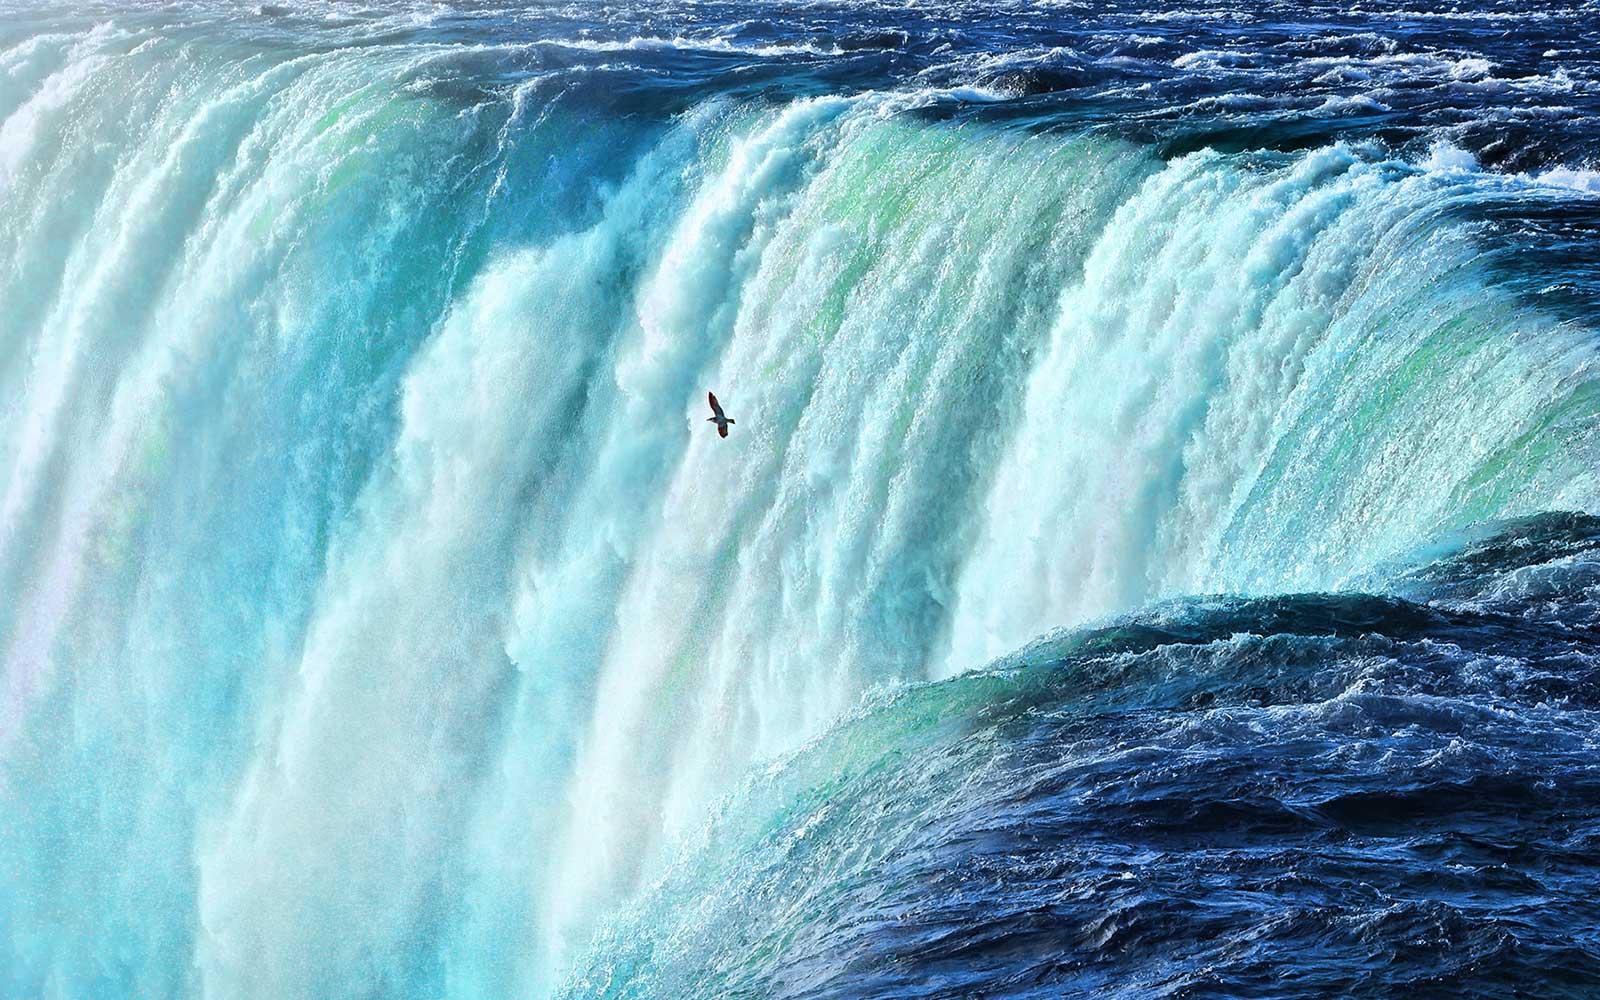 Океан звуков с<br>технологией Ultra Surround1